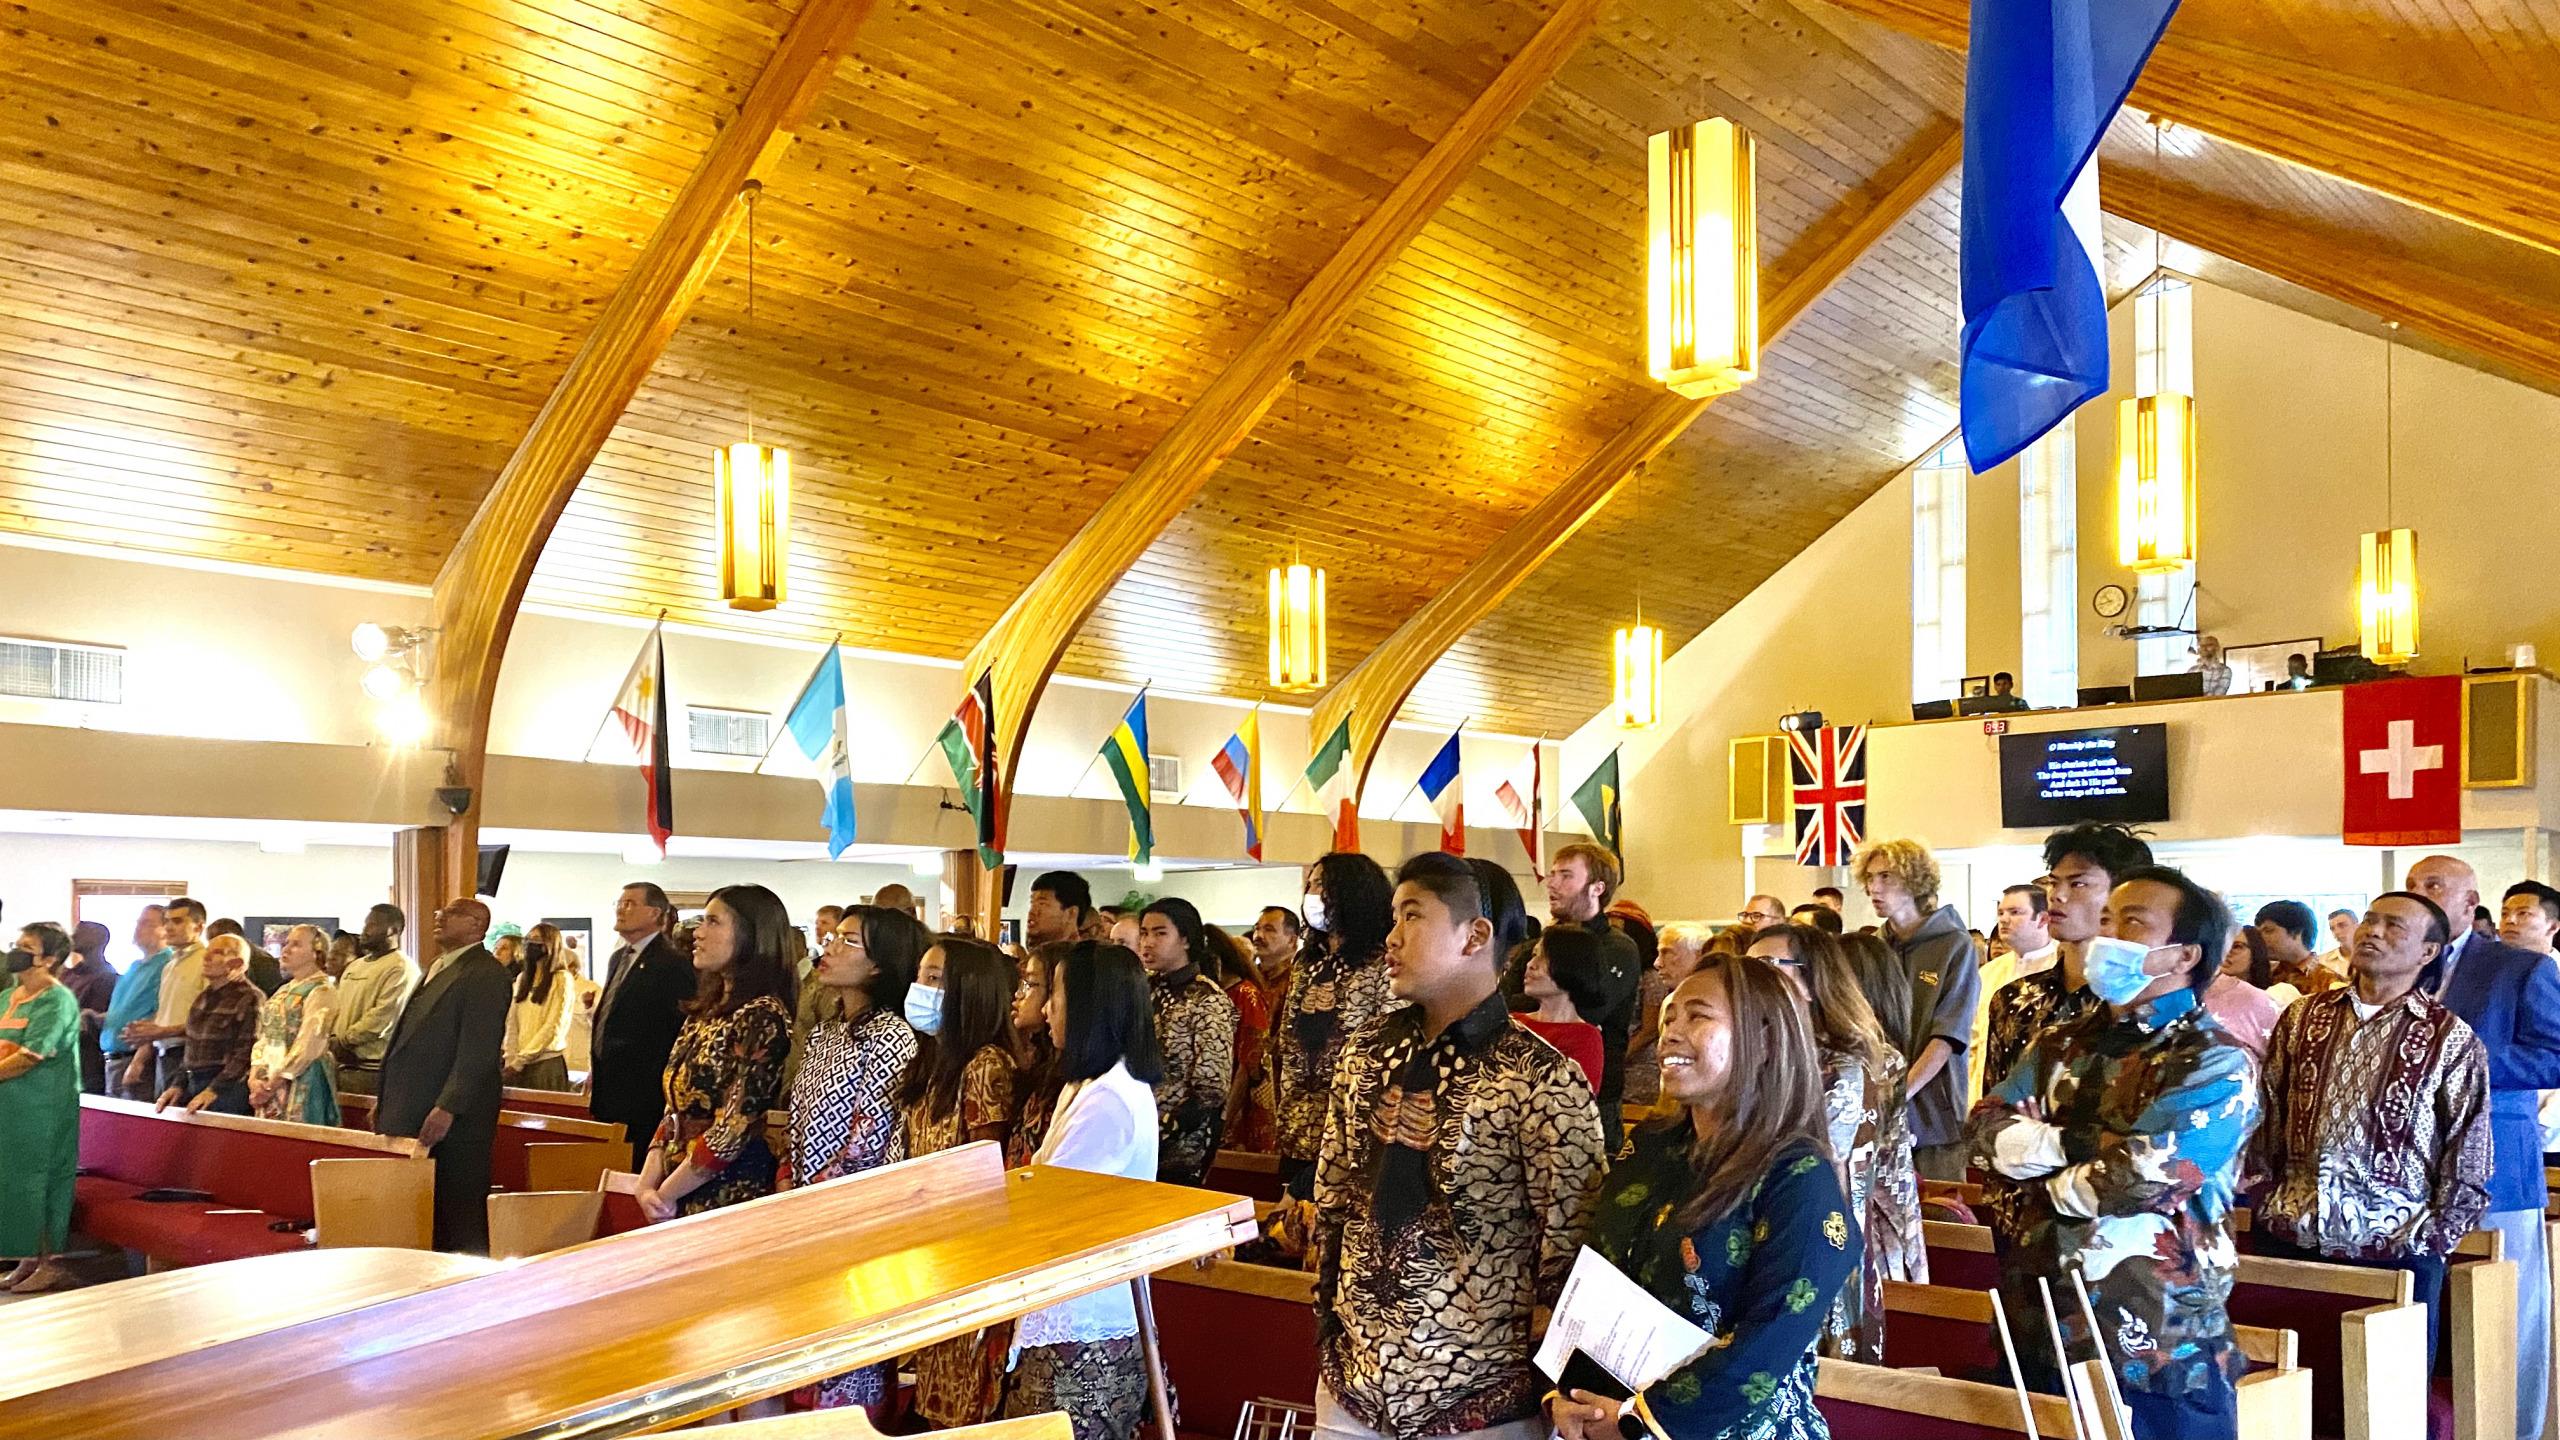 COLORADO SPRINGS CENTRAL CHURCH CELEBRATES INTERNATIONAL SABBATH